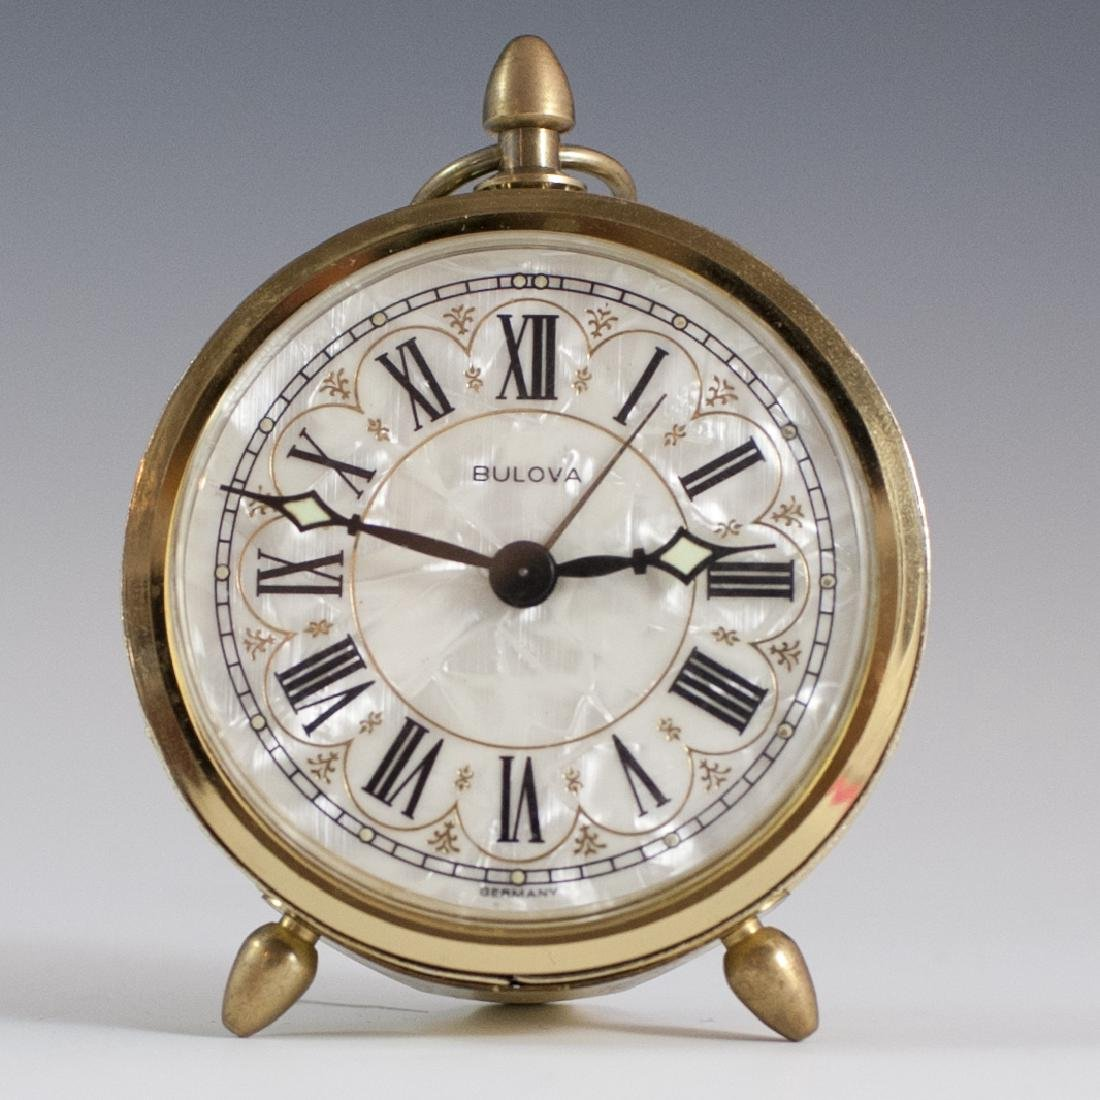 Bulova Mother of Pearl Alarm Clock